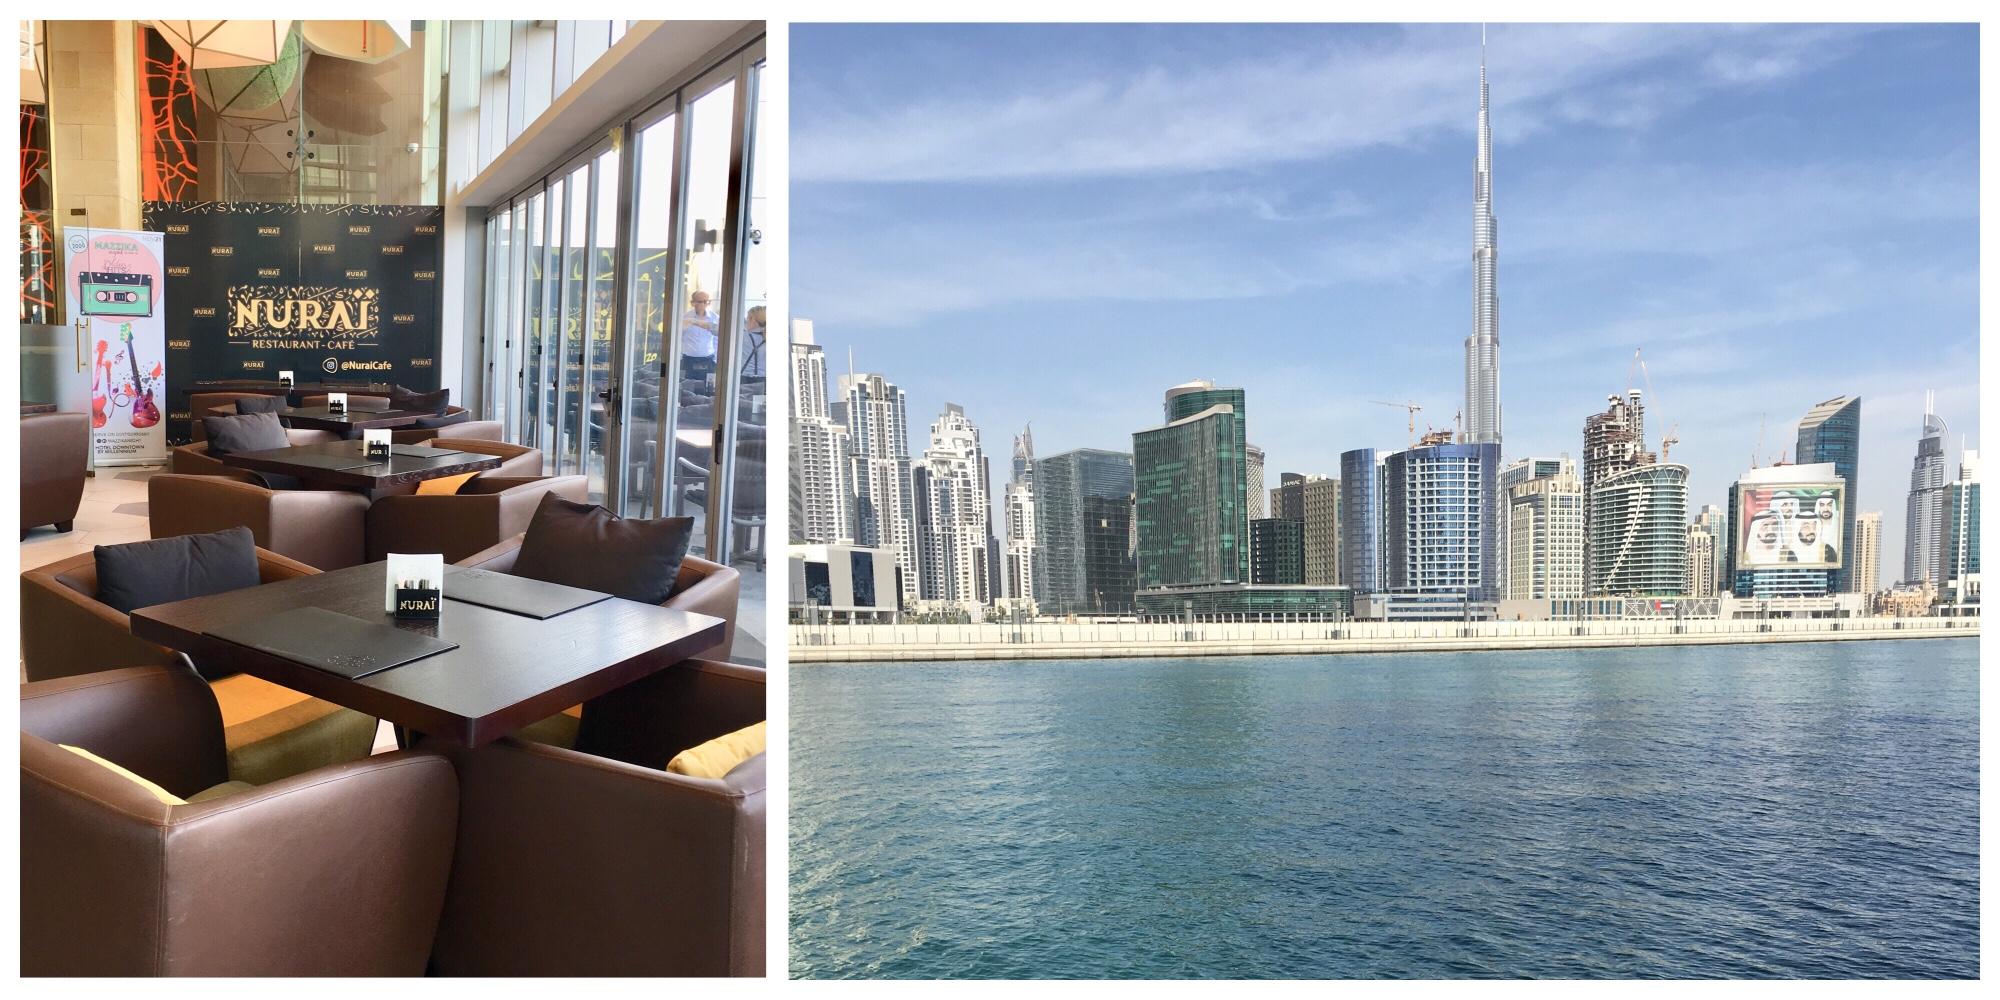 Burj view restaurants in Business Bay